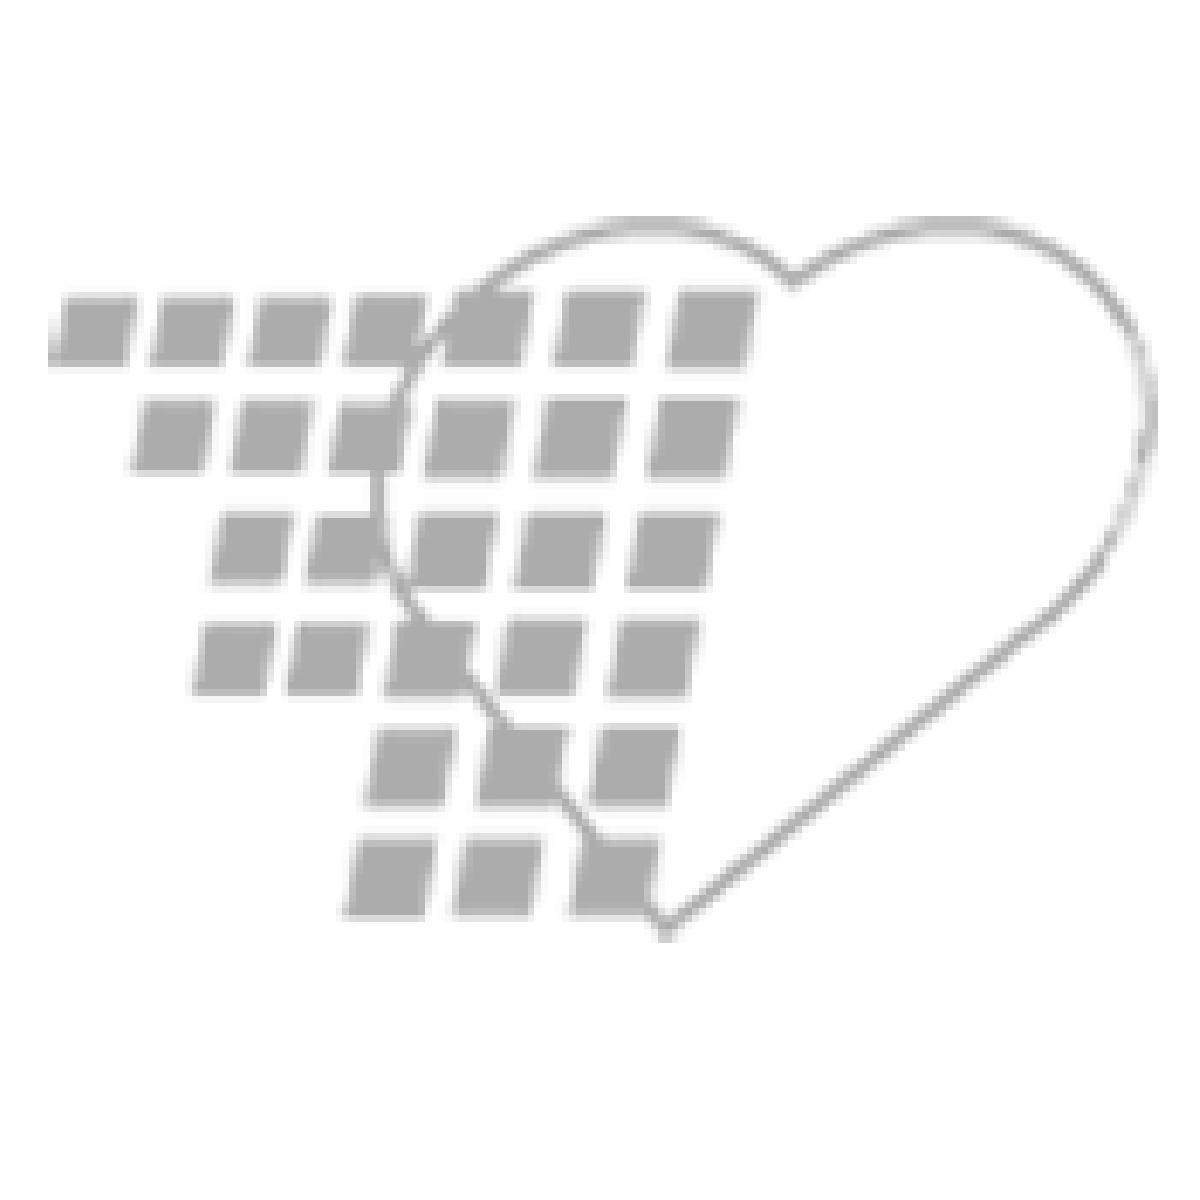 05-41-1739 HolliHesive Paste - 2 oz